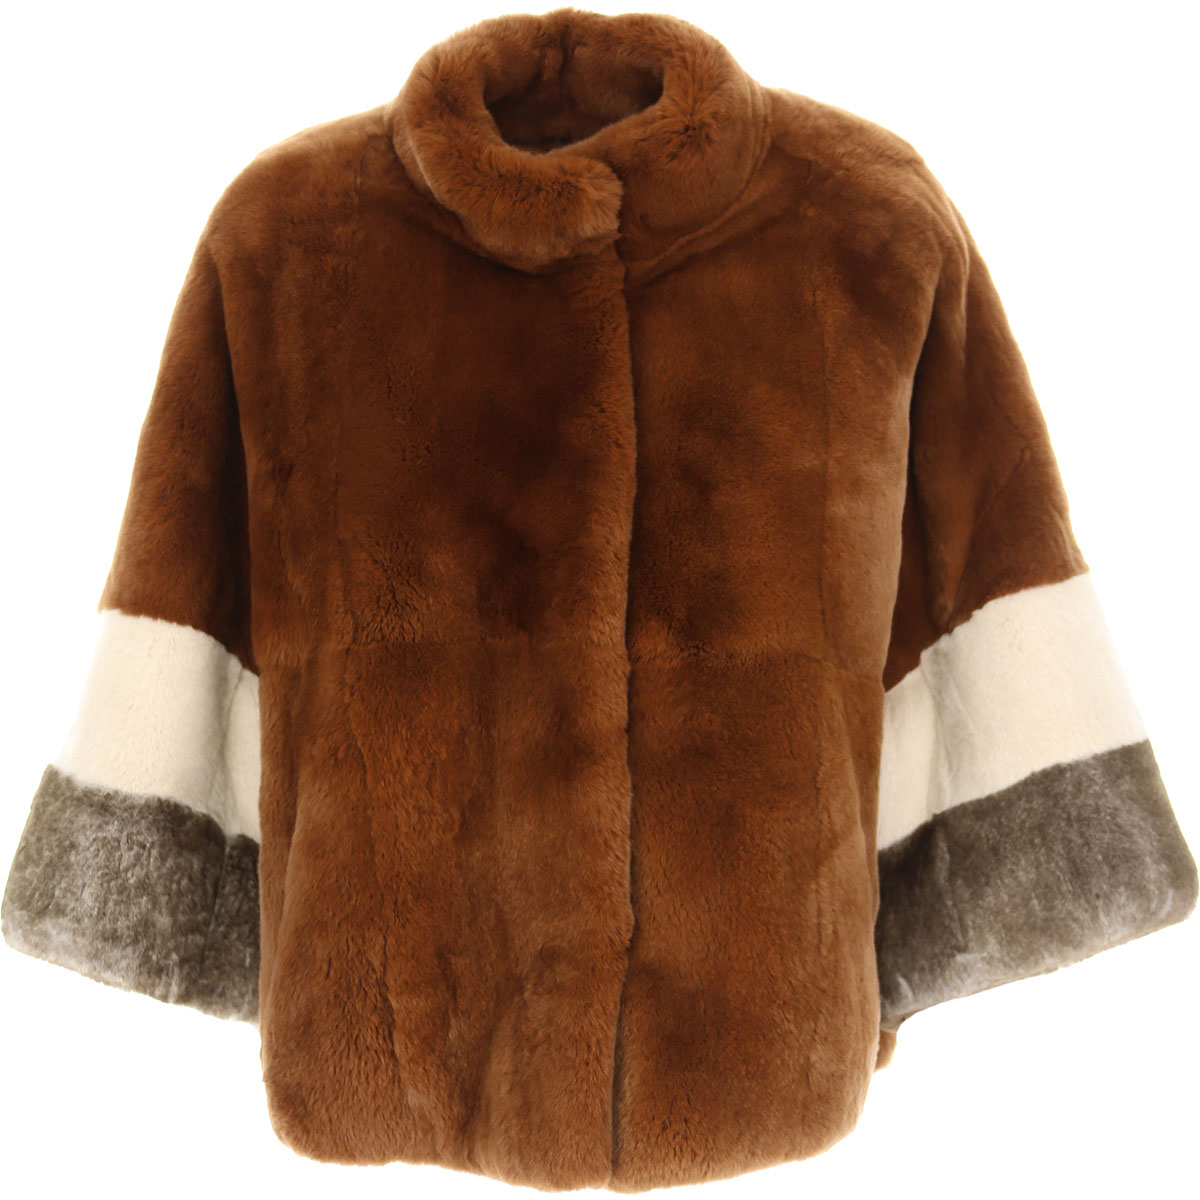 S.W.O.R.D Jacket for Women On Sale, Camel, Fur, 2019, 8